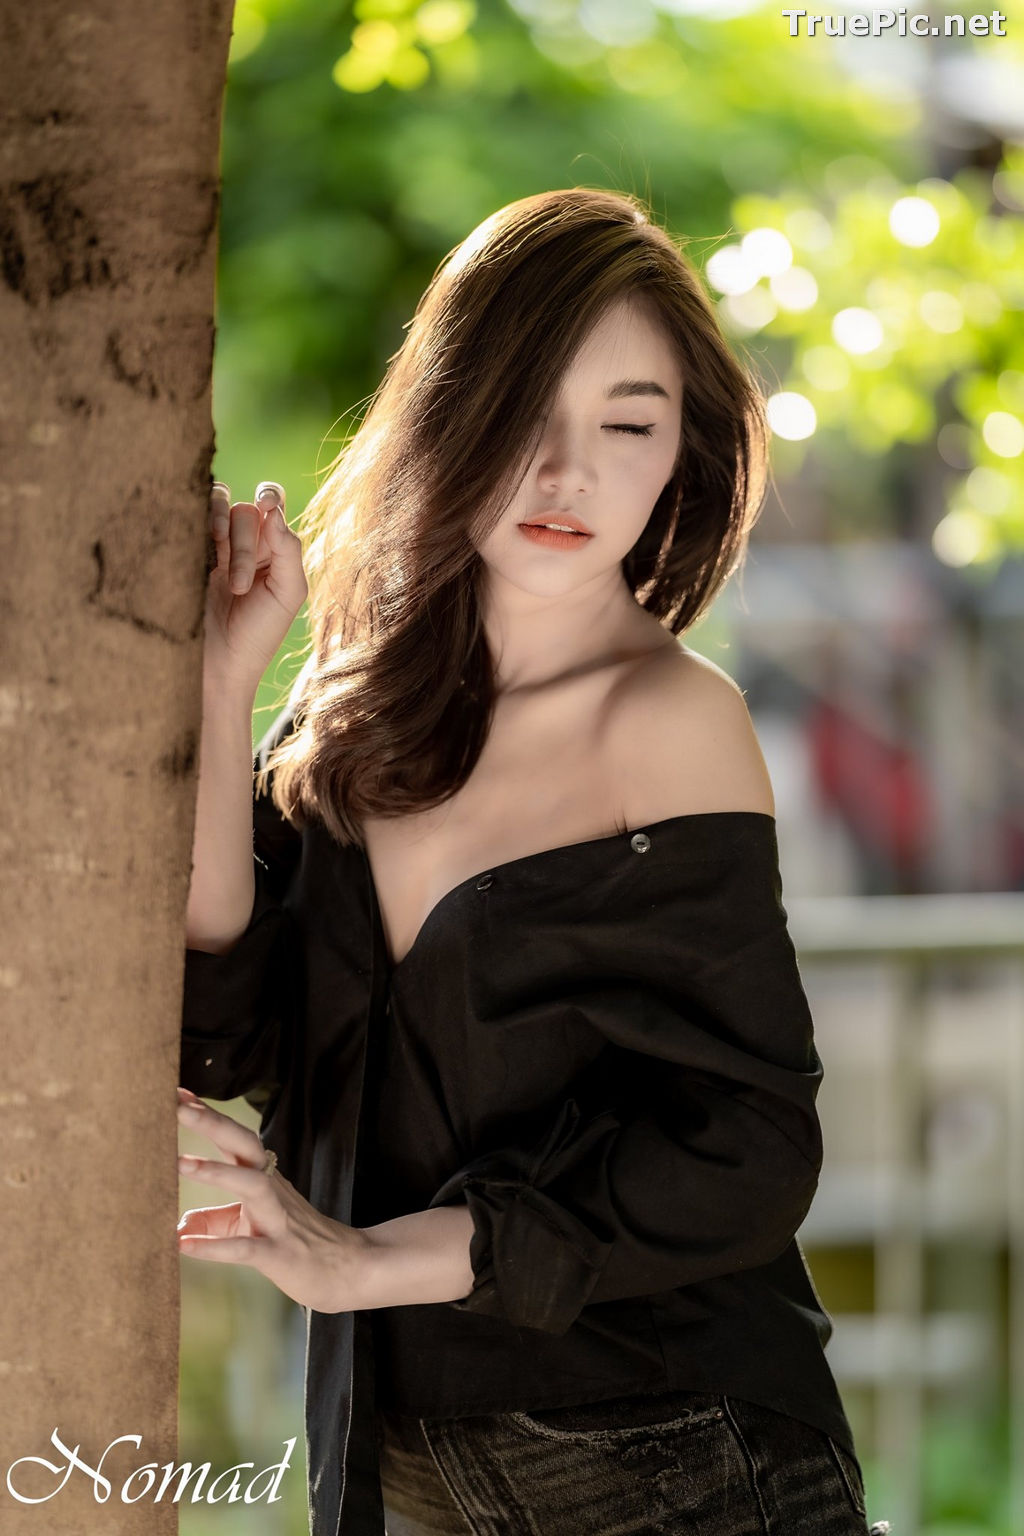 Image Thailand Model - Jarunan Tavepanya - Beautiful In Black and White - TruePic.net - Picture-8